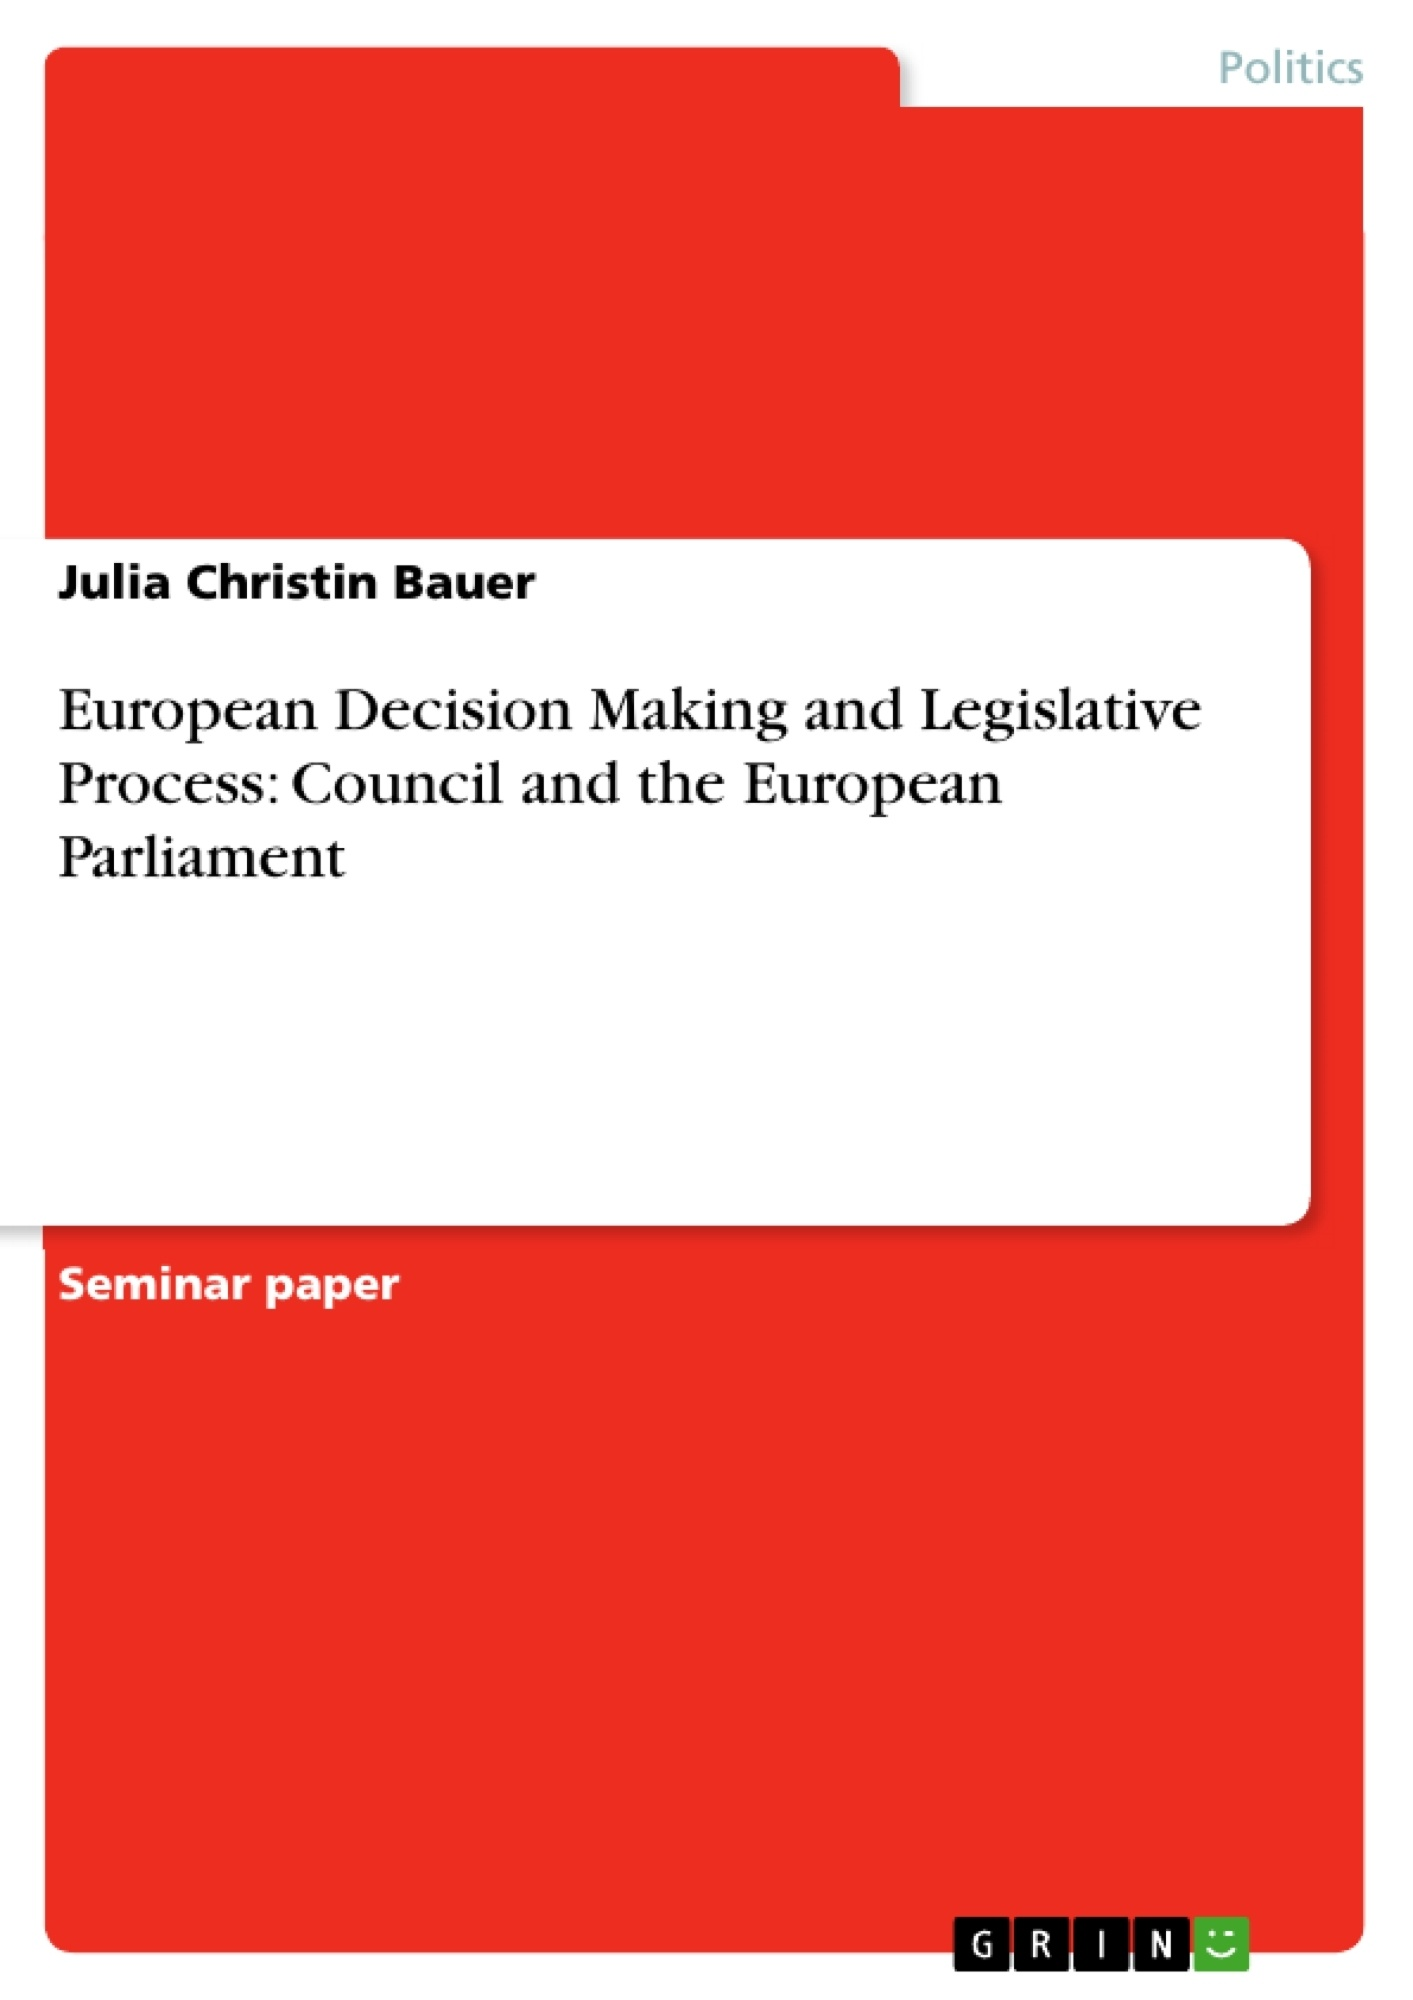 Title: European Decision Making and Legislative Process: Council and the European Parliament